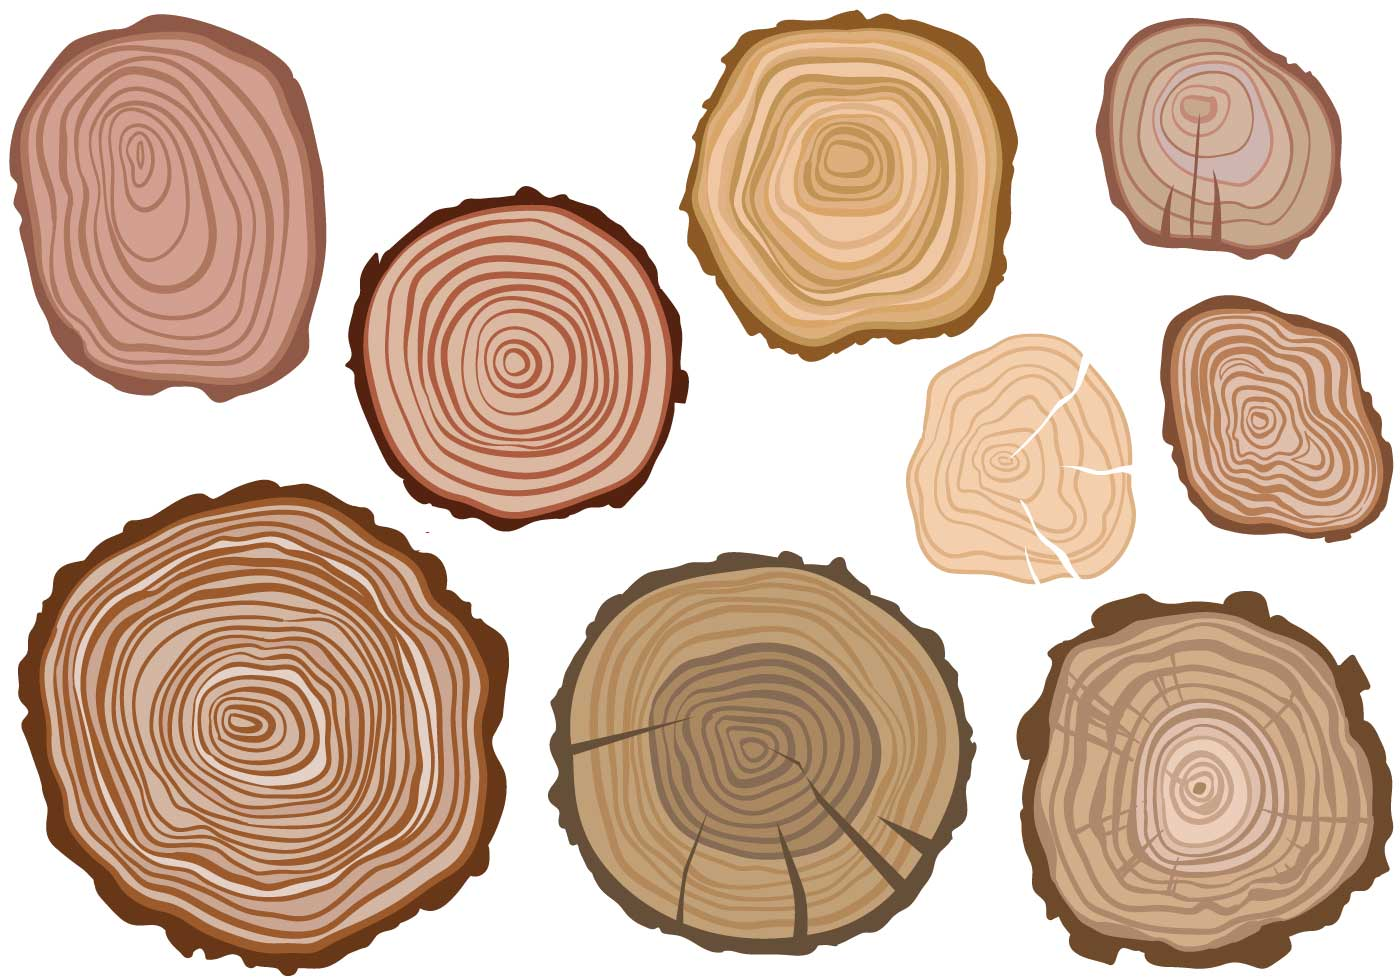 free tree rings vectors download free vector art stock graphics rh vecteezy com Black White and Wood Grain Vector Vector Wood Grain Heart